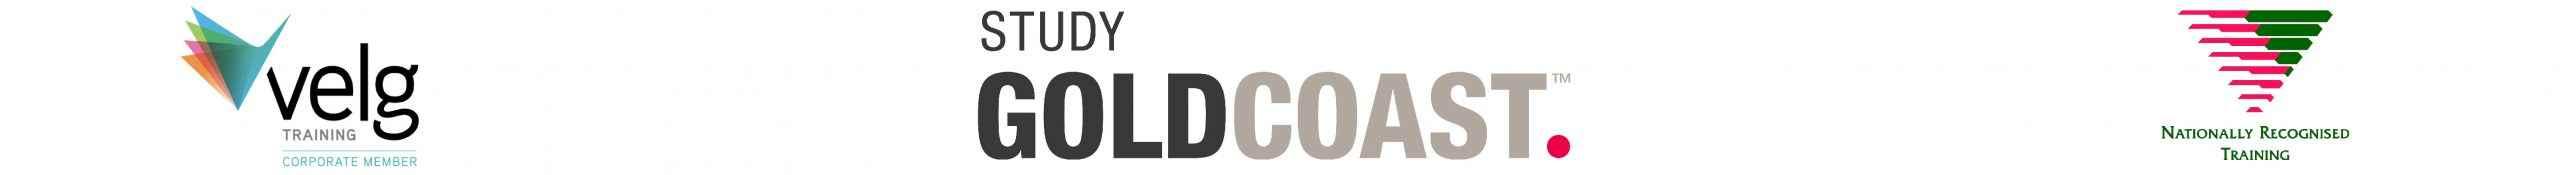 Study Gold Coast Logo